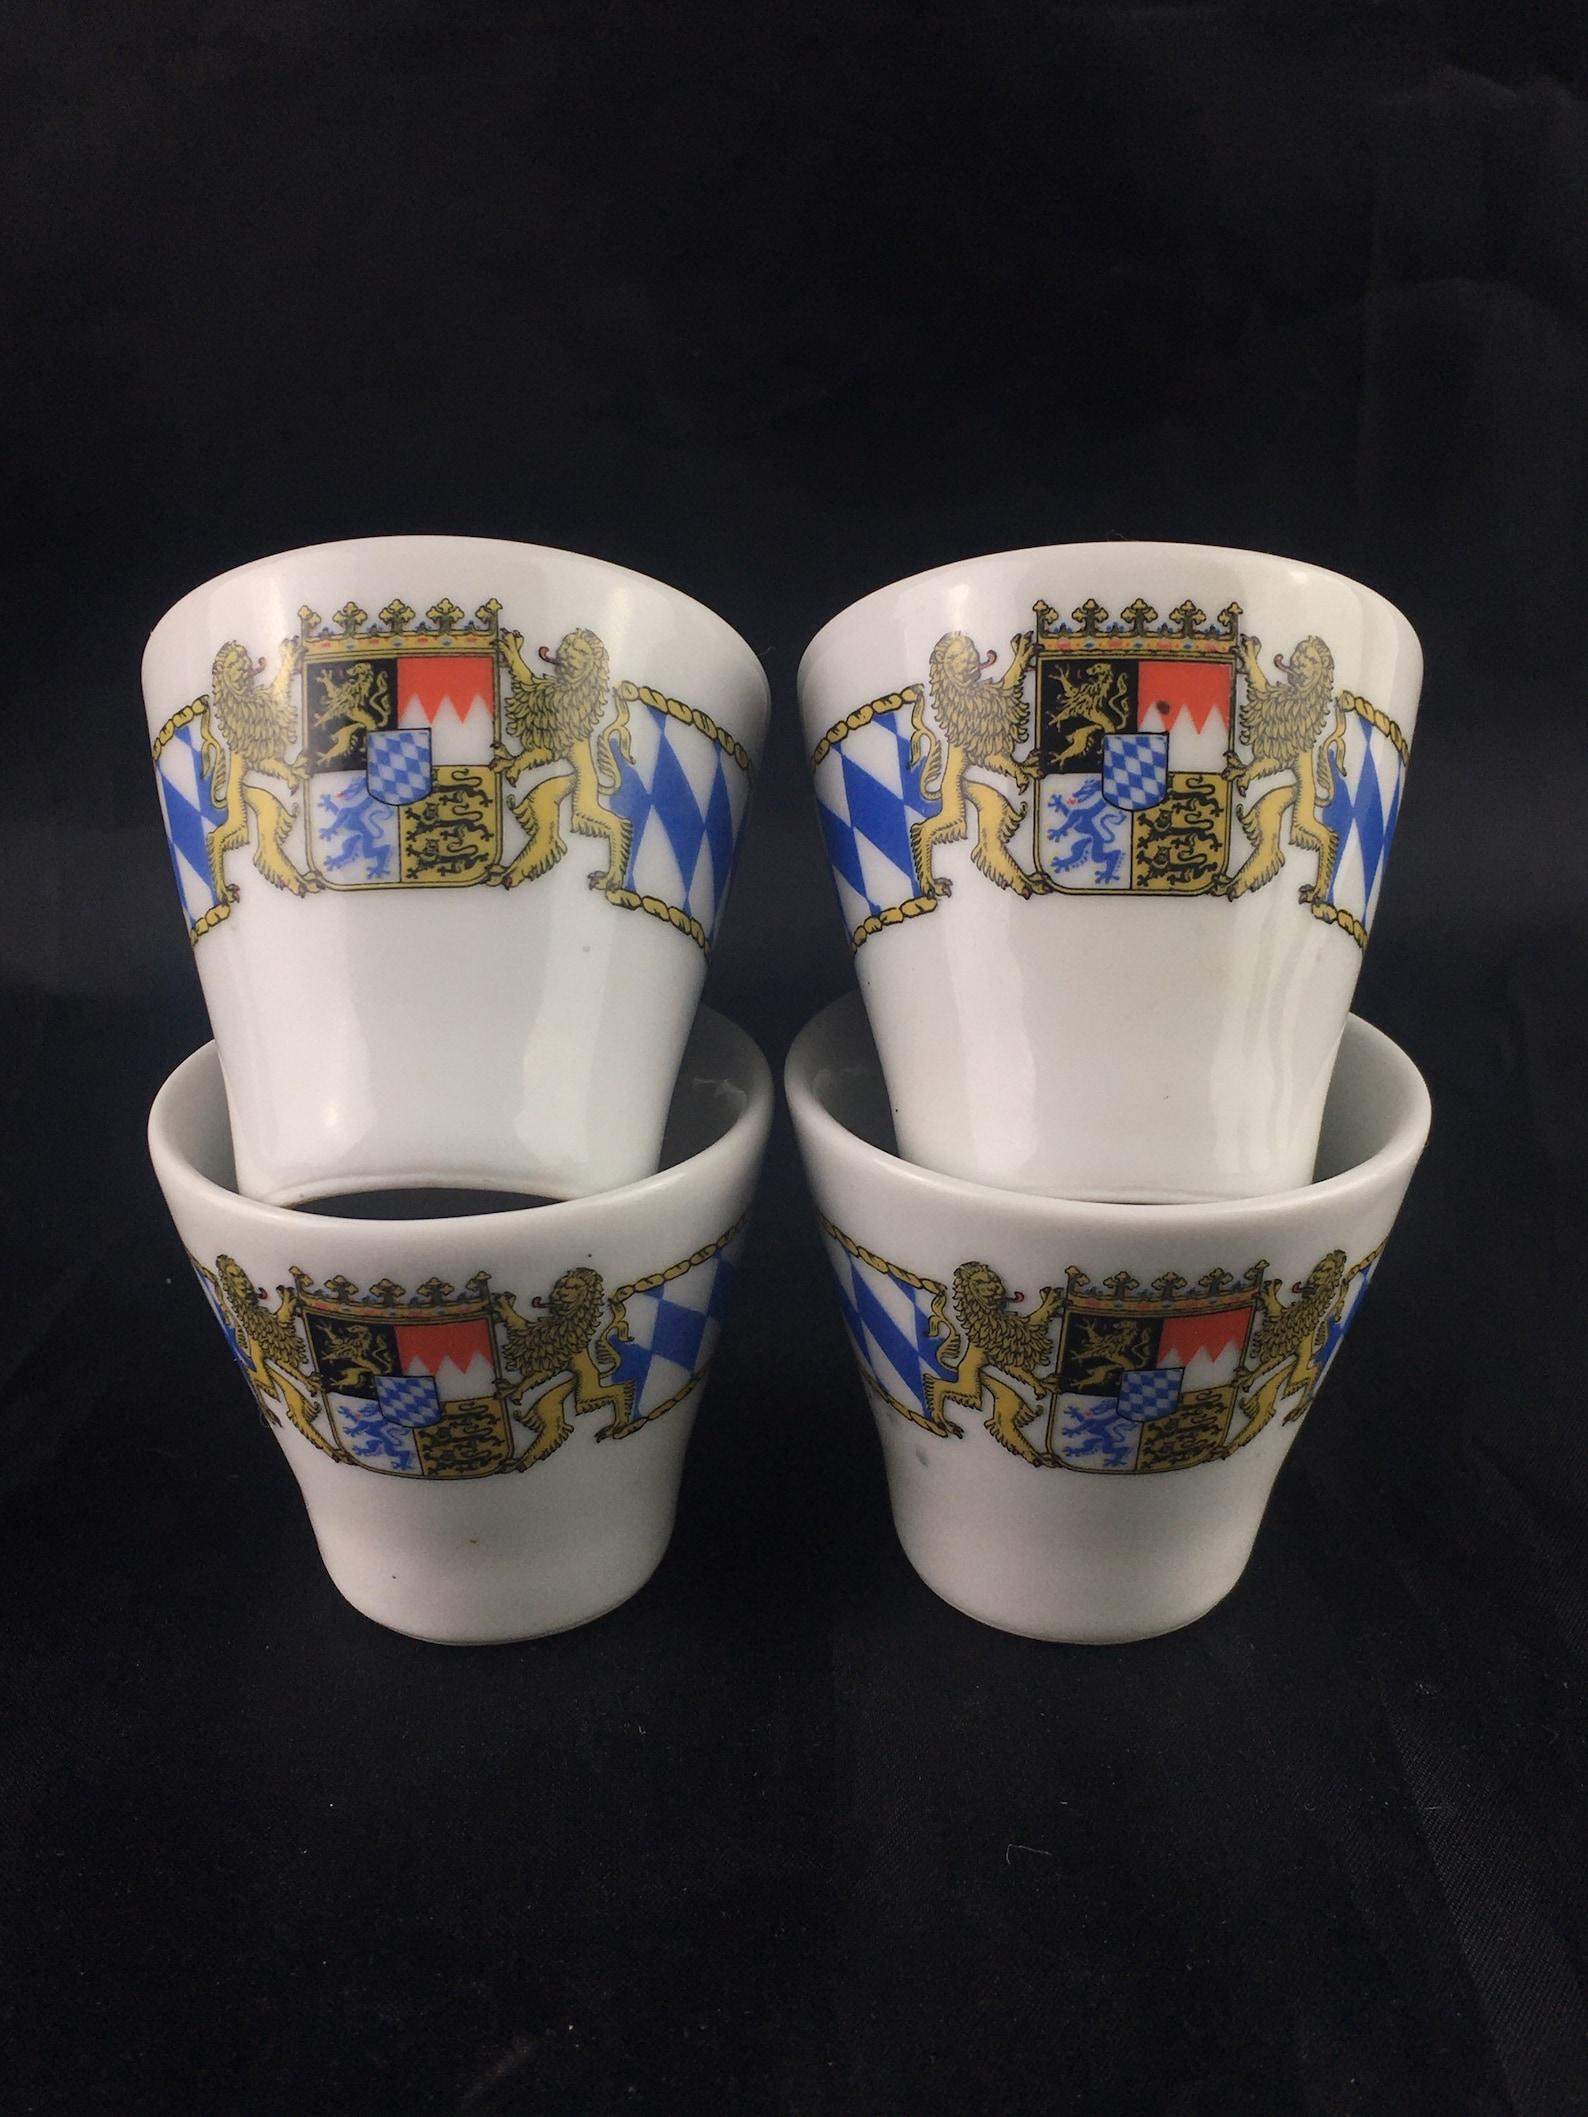 Bavarian egg cups, German egg cups